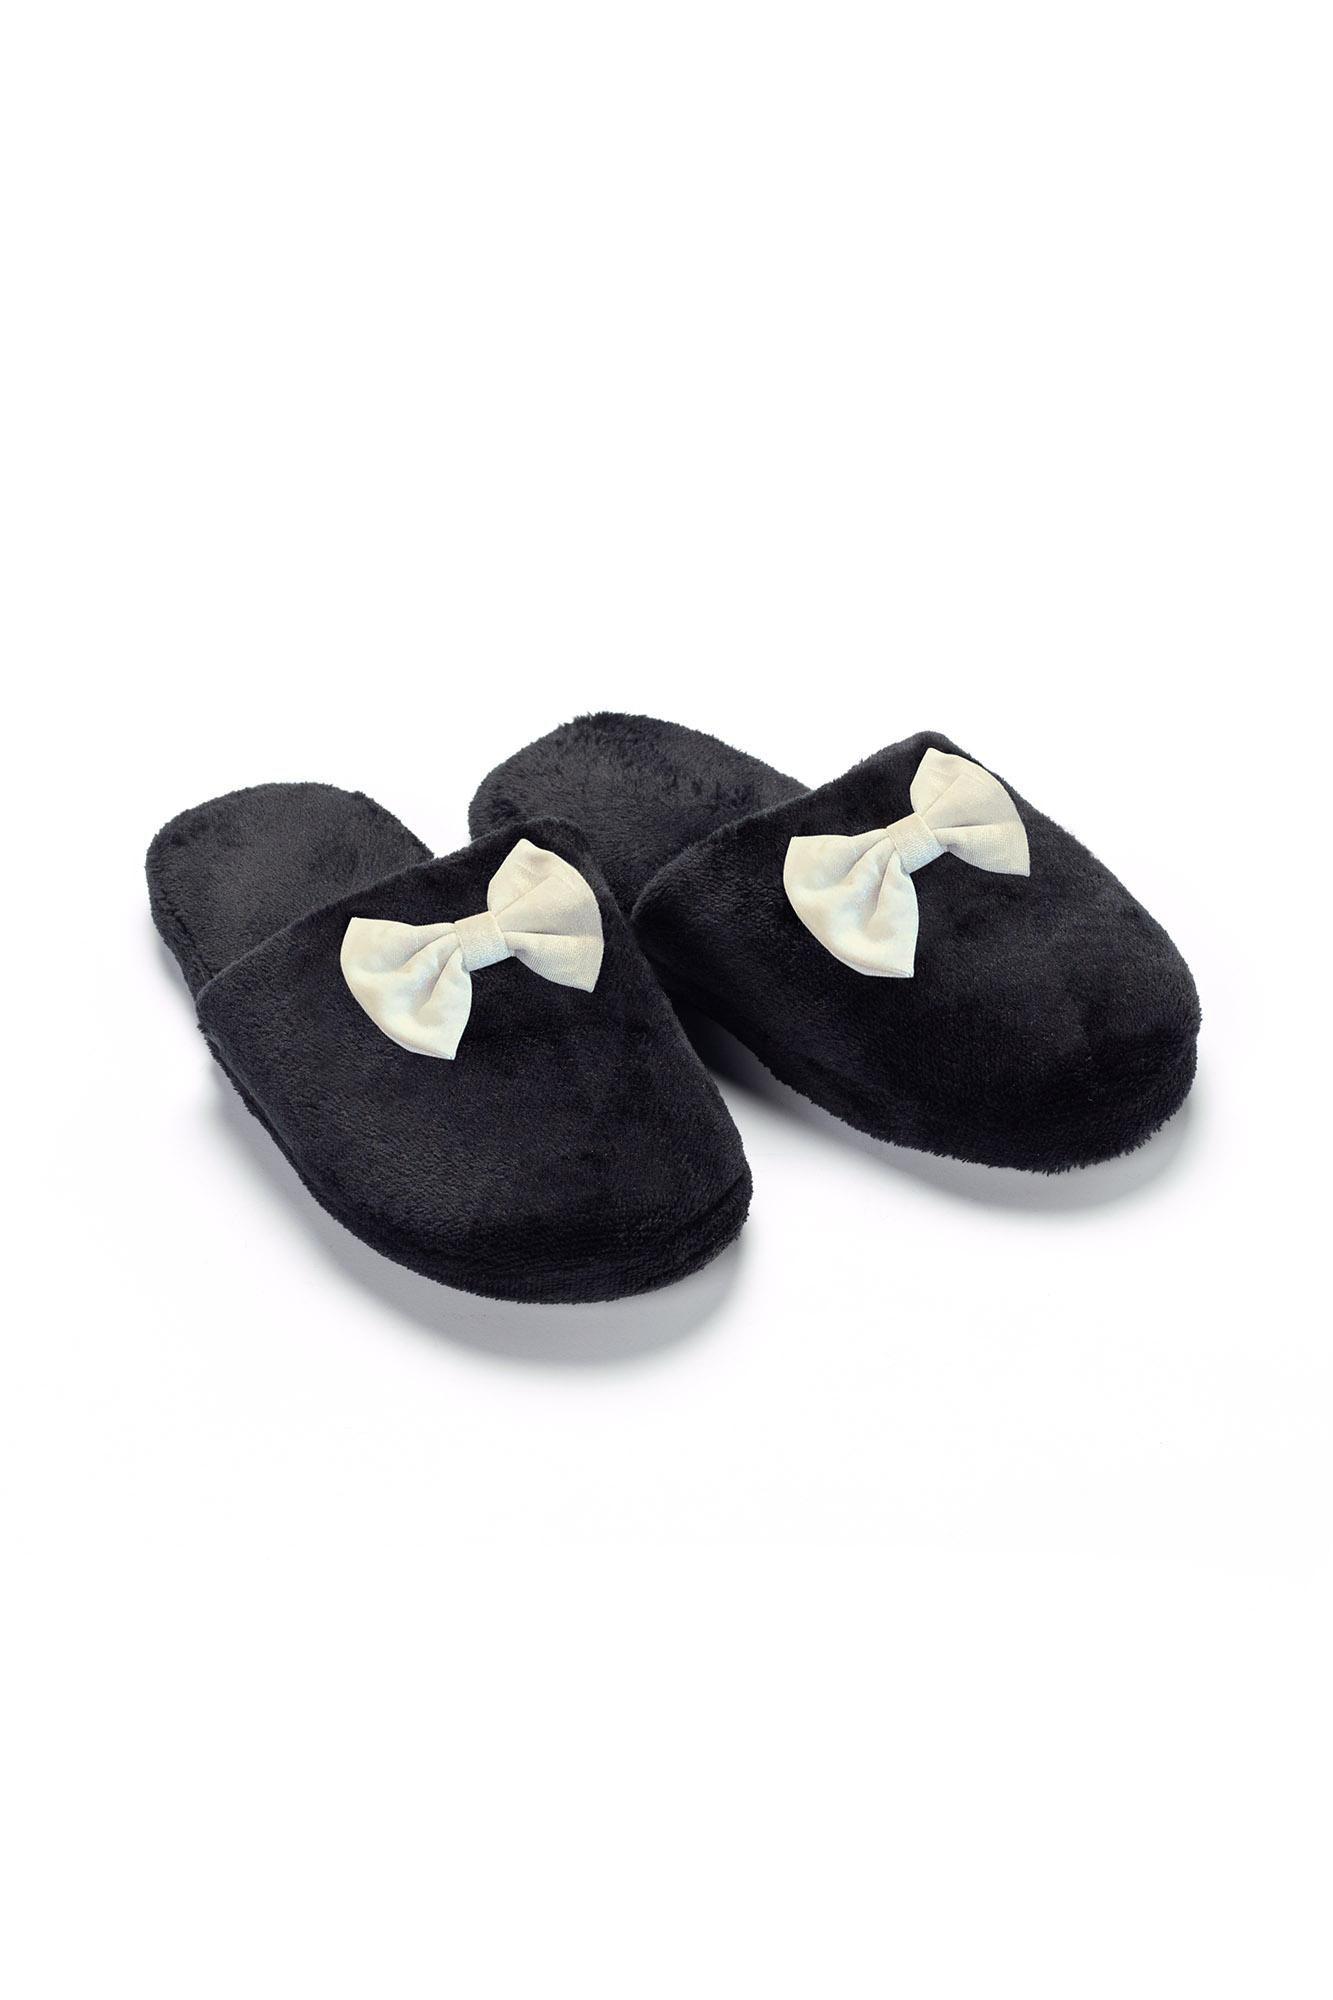 Fleece Παντόφλες με Φιόγκο